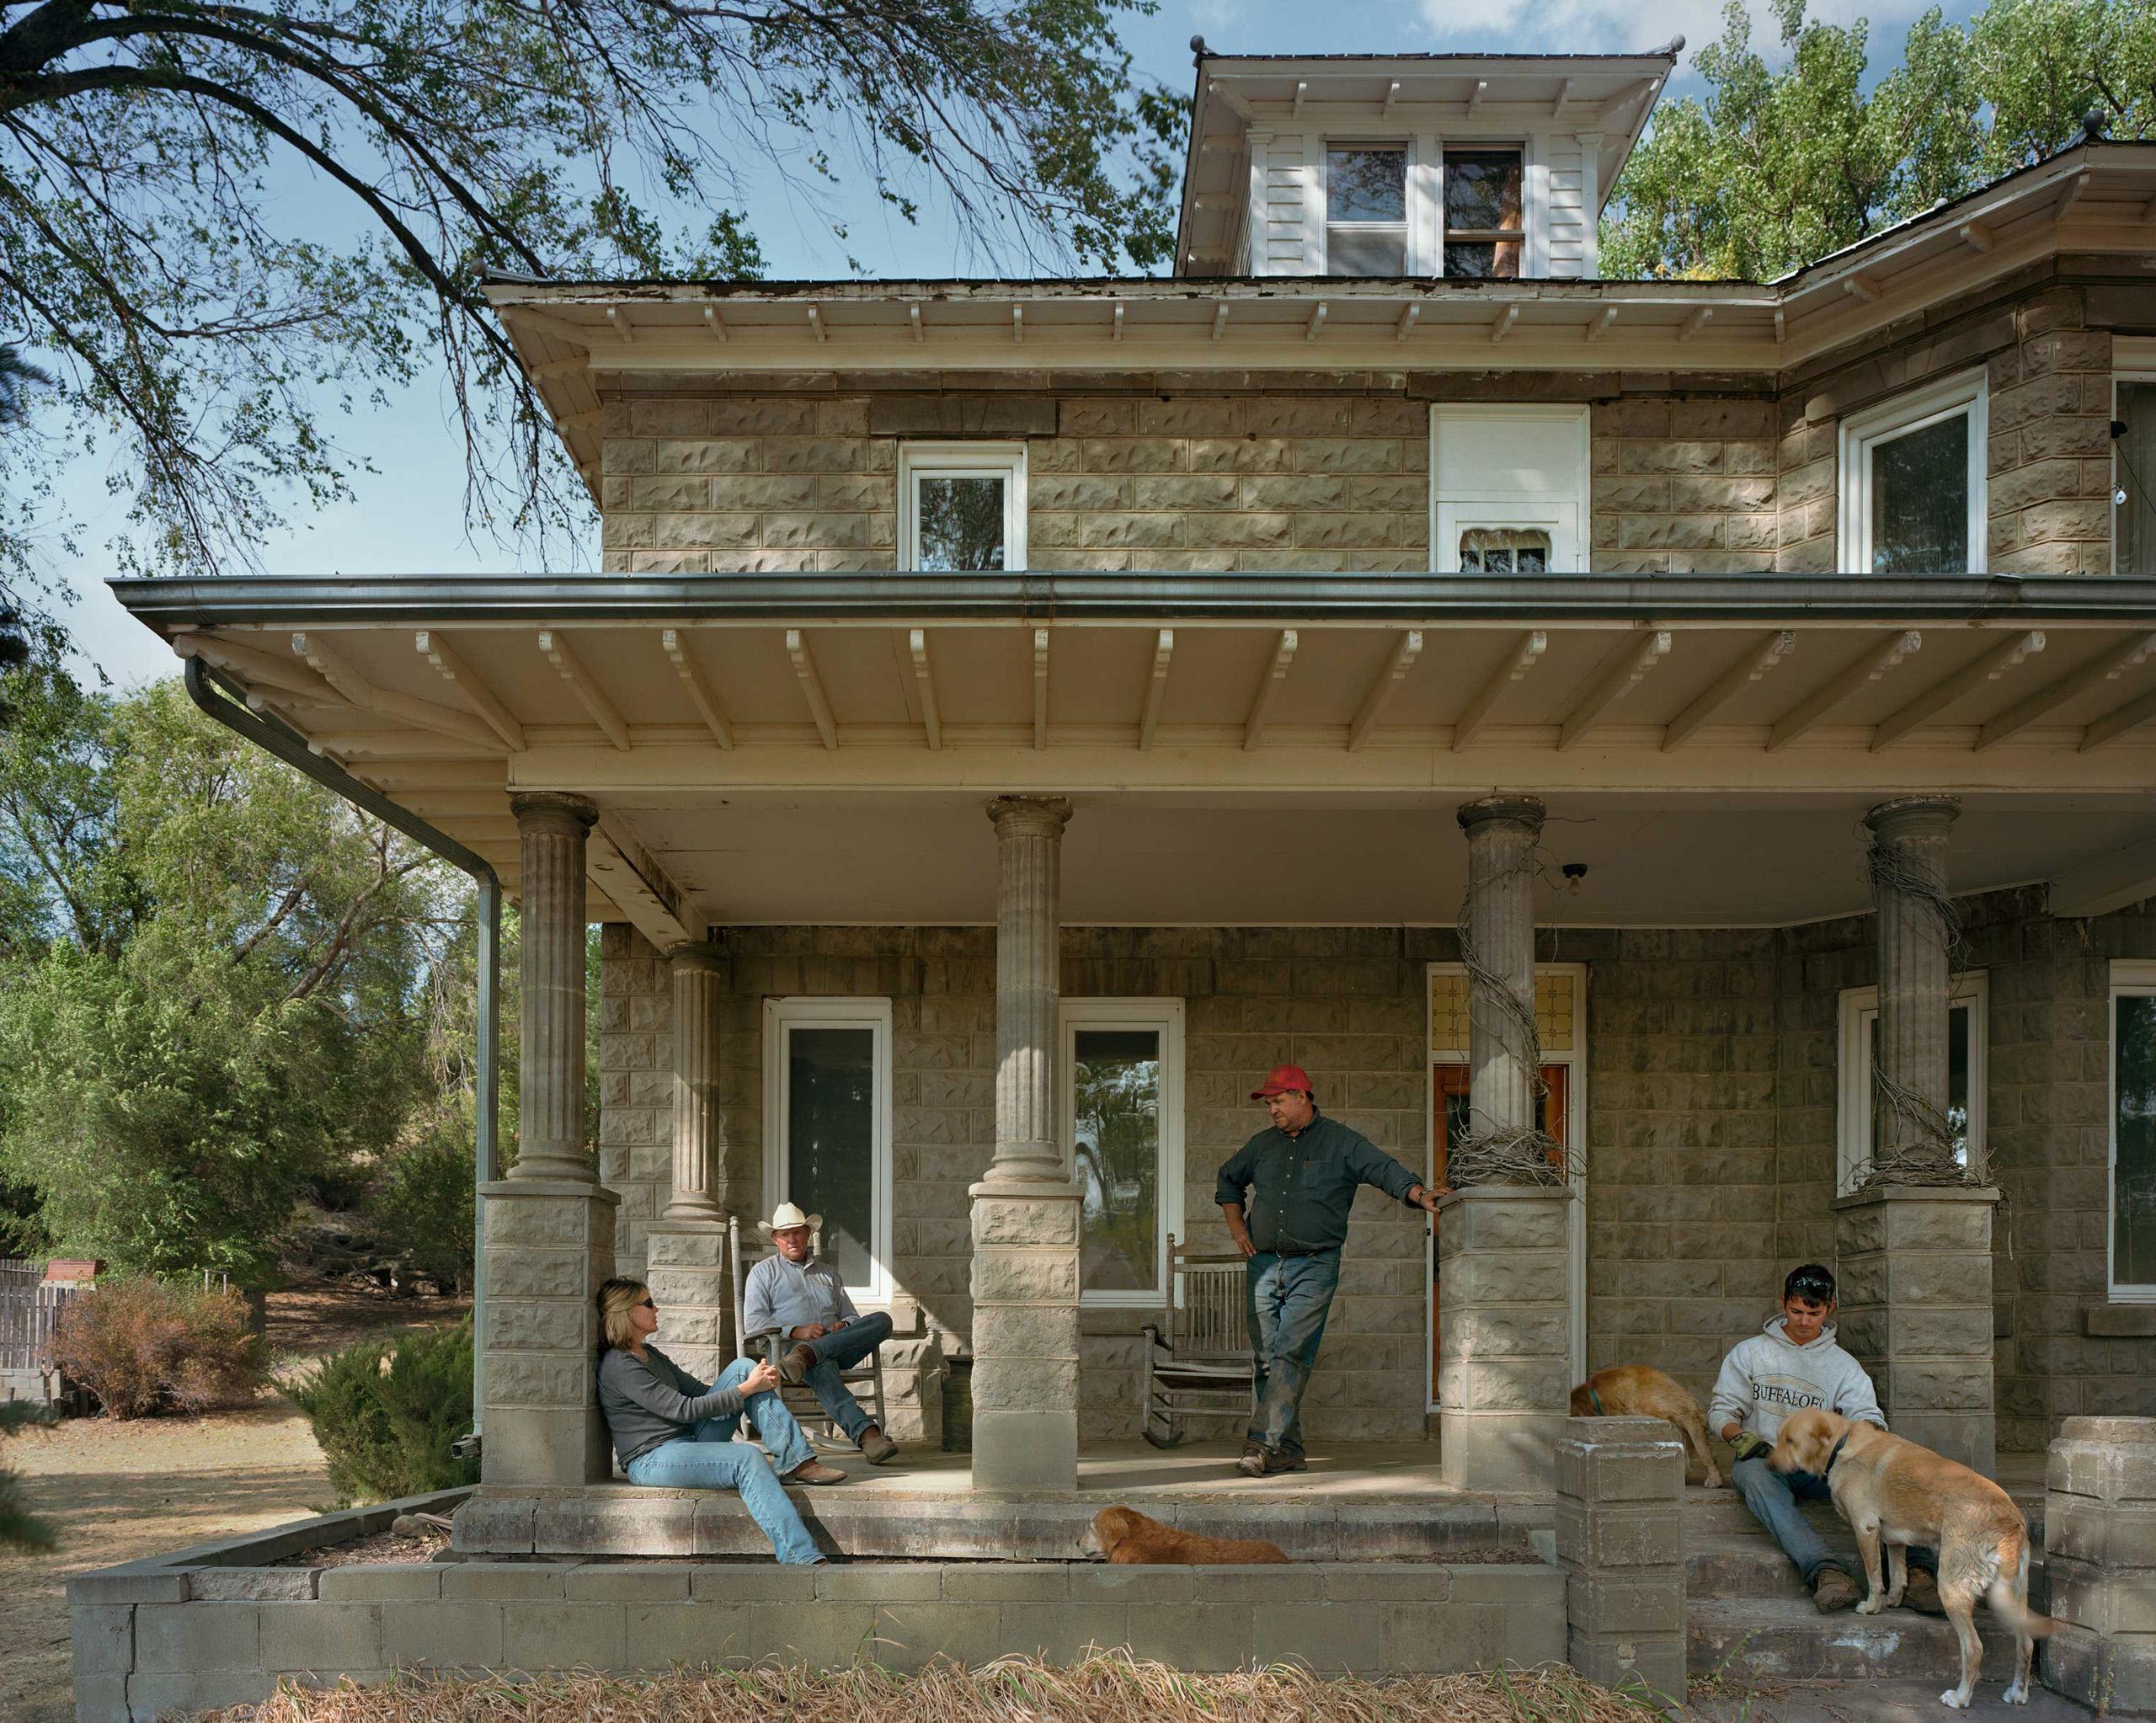 Abbott Family At The Big House. Cherry County, Nebraska, 2012.